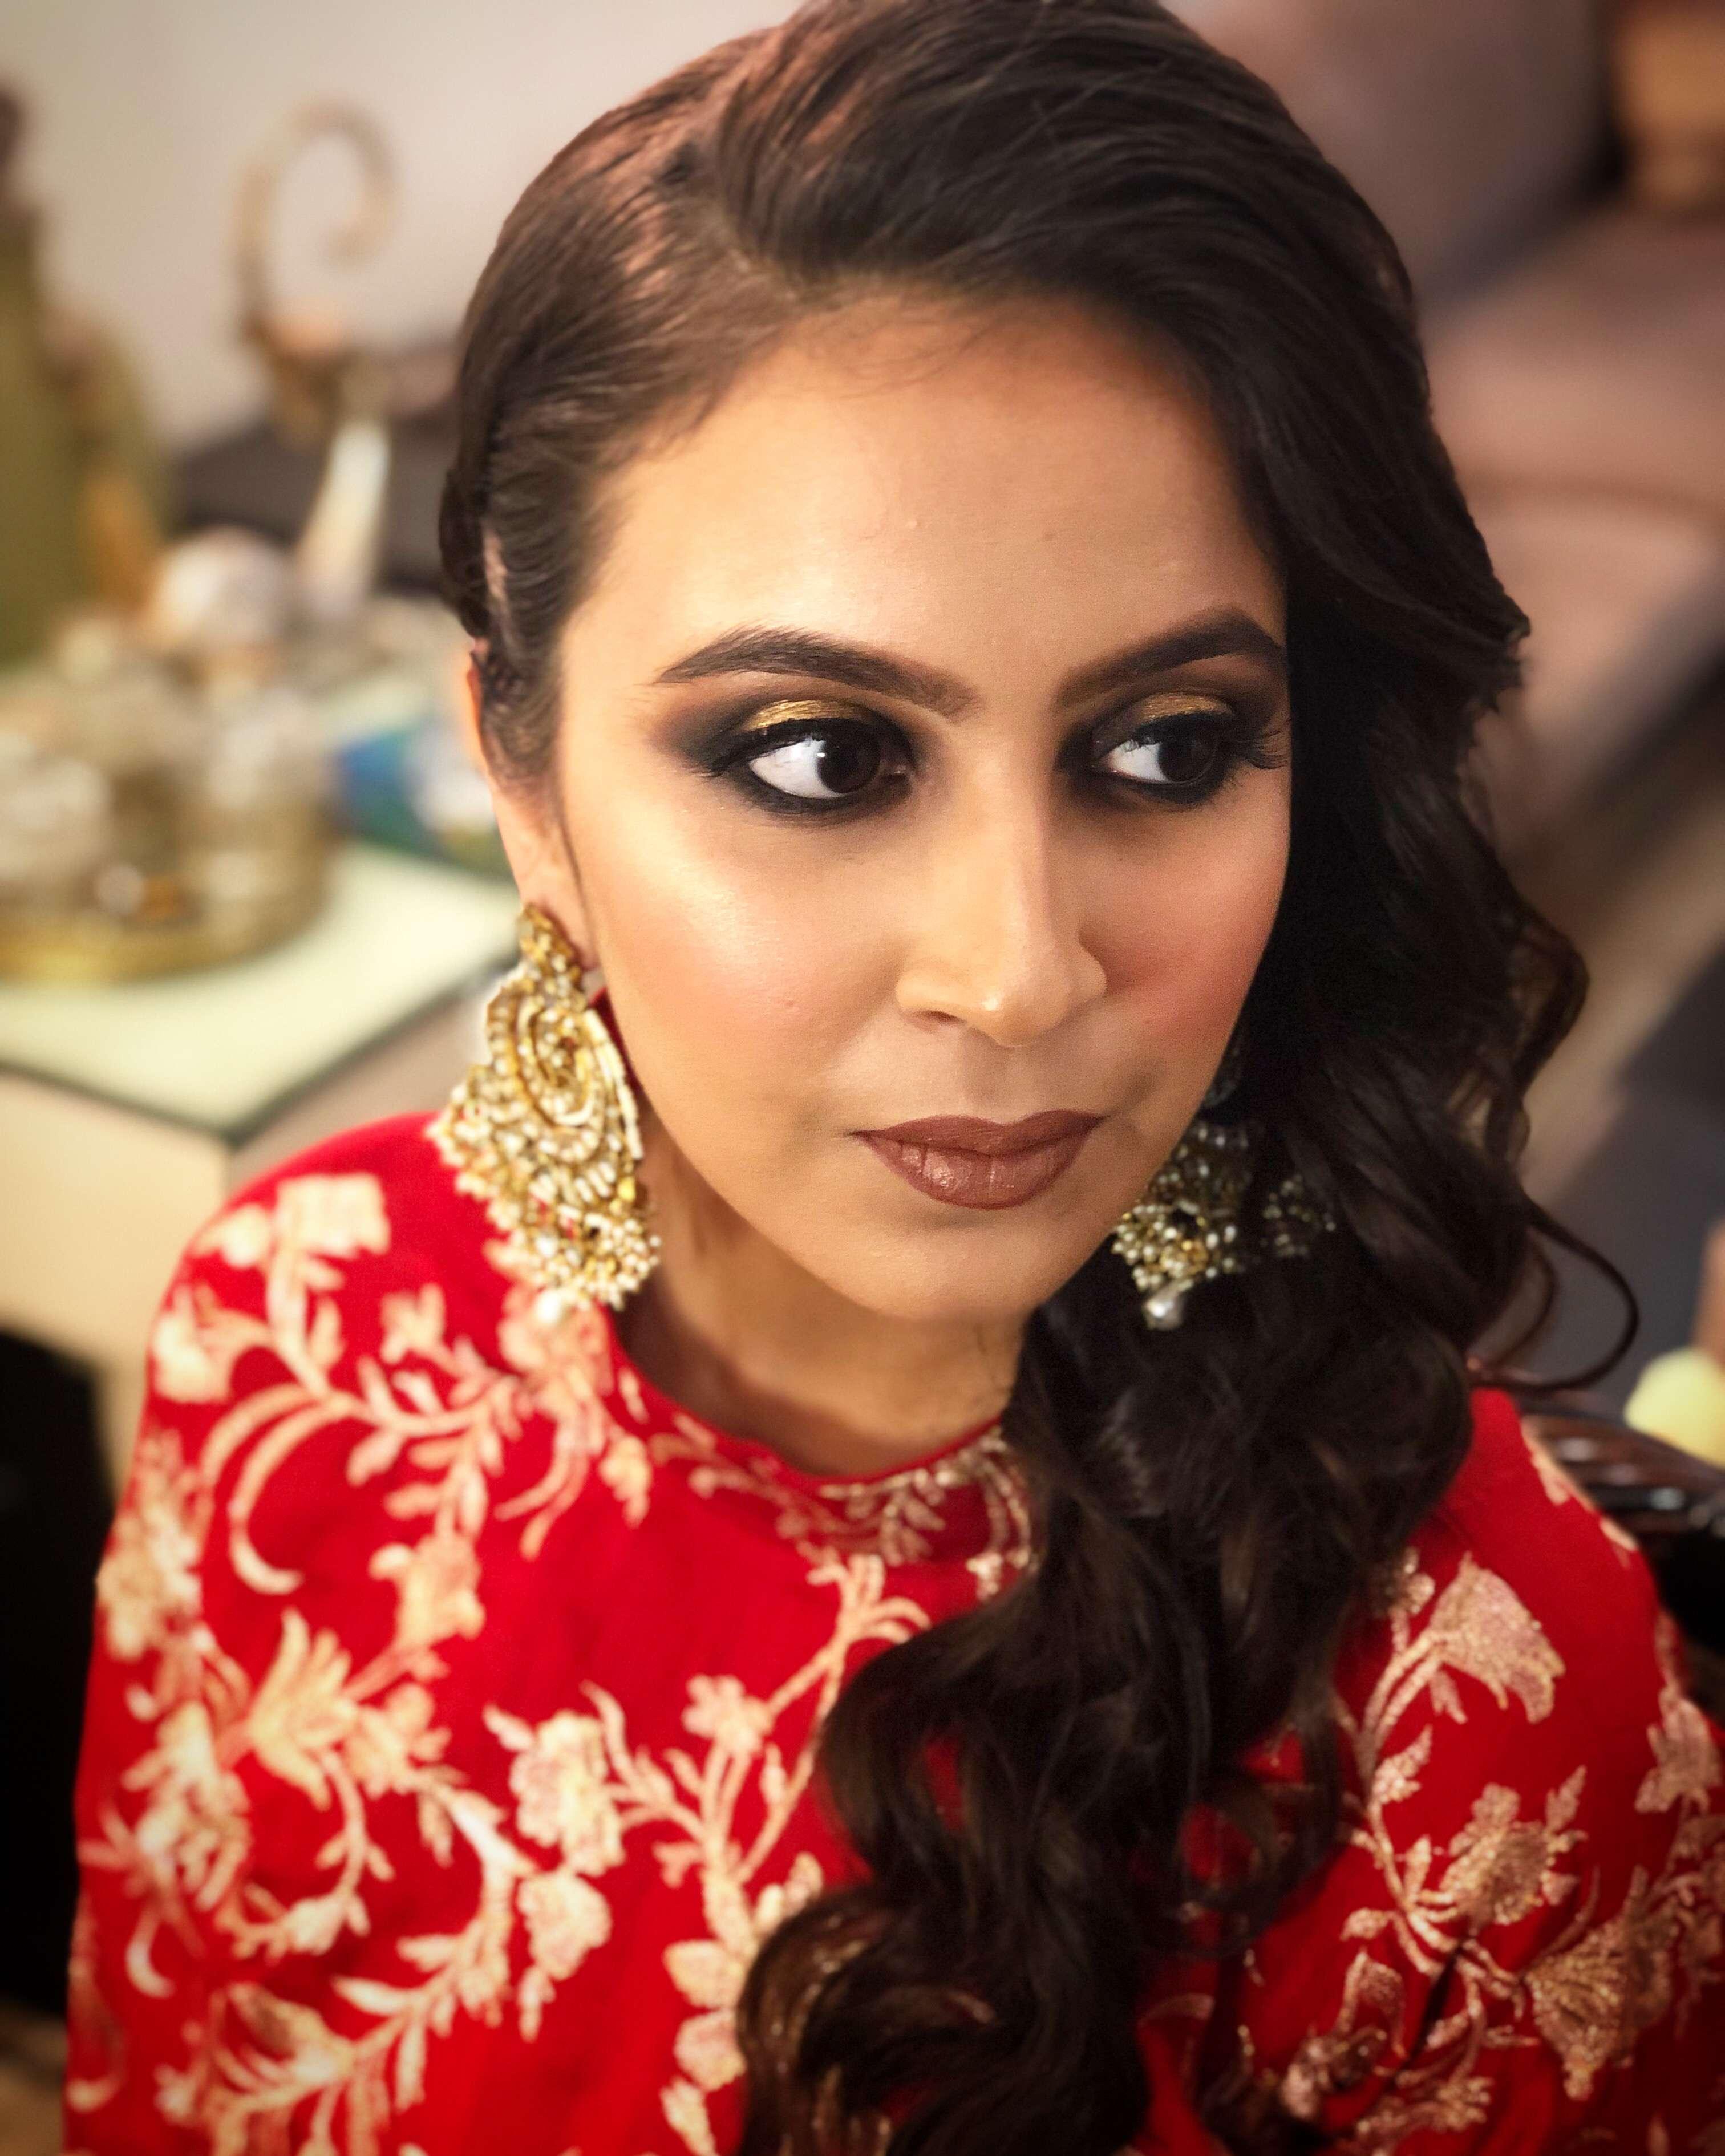 Portfolio - Makeup by Lipika Jhunjhunwala